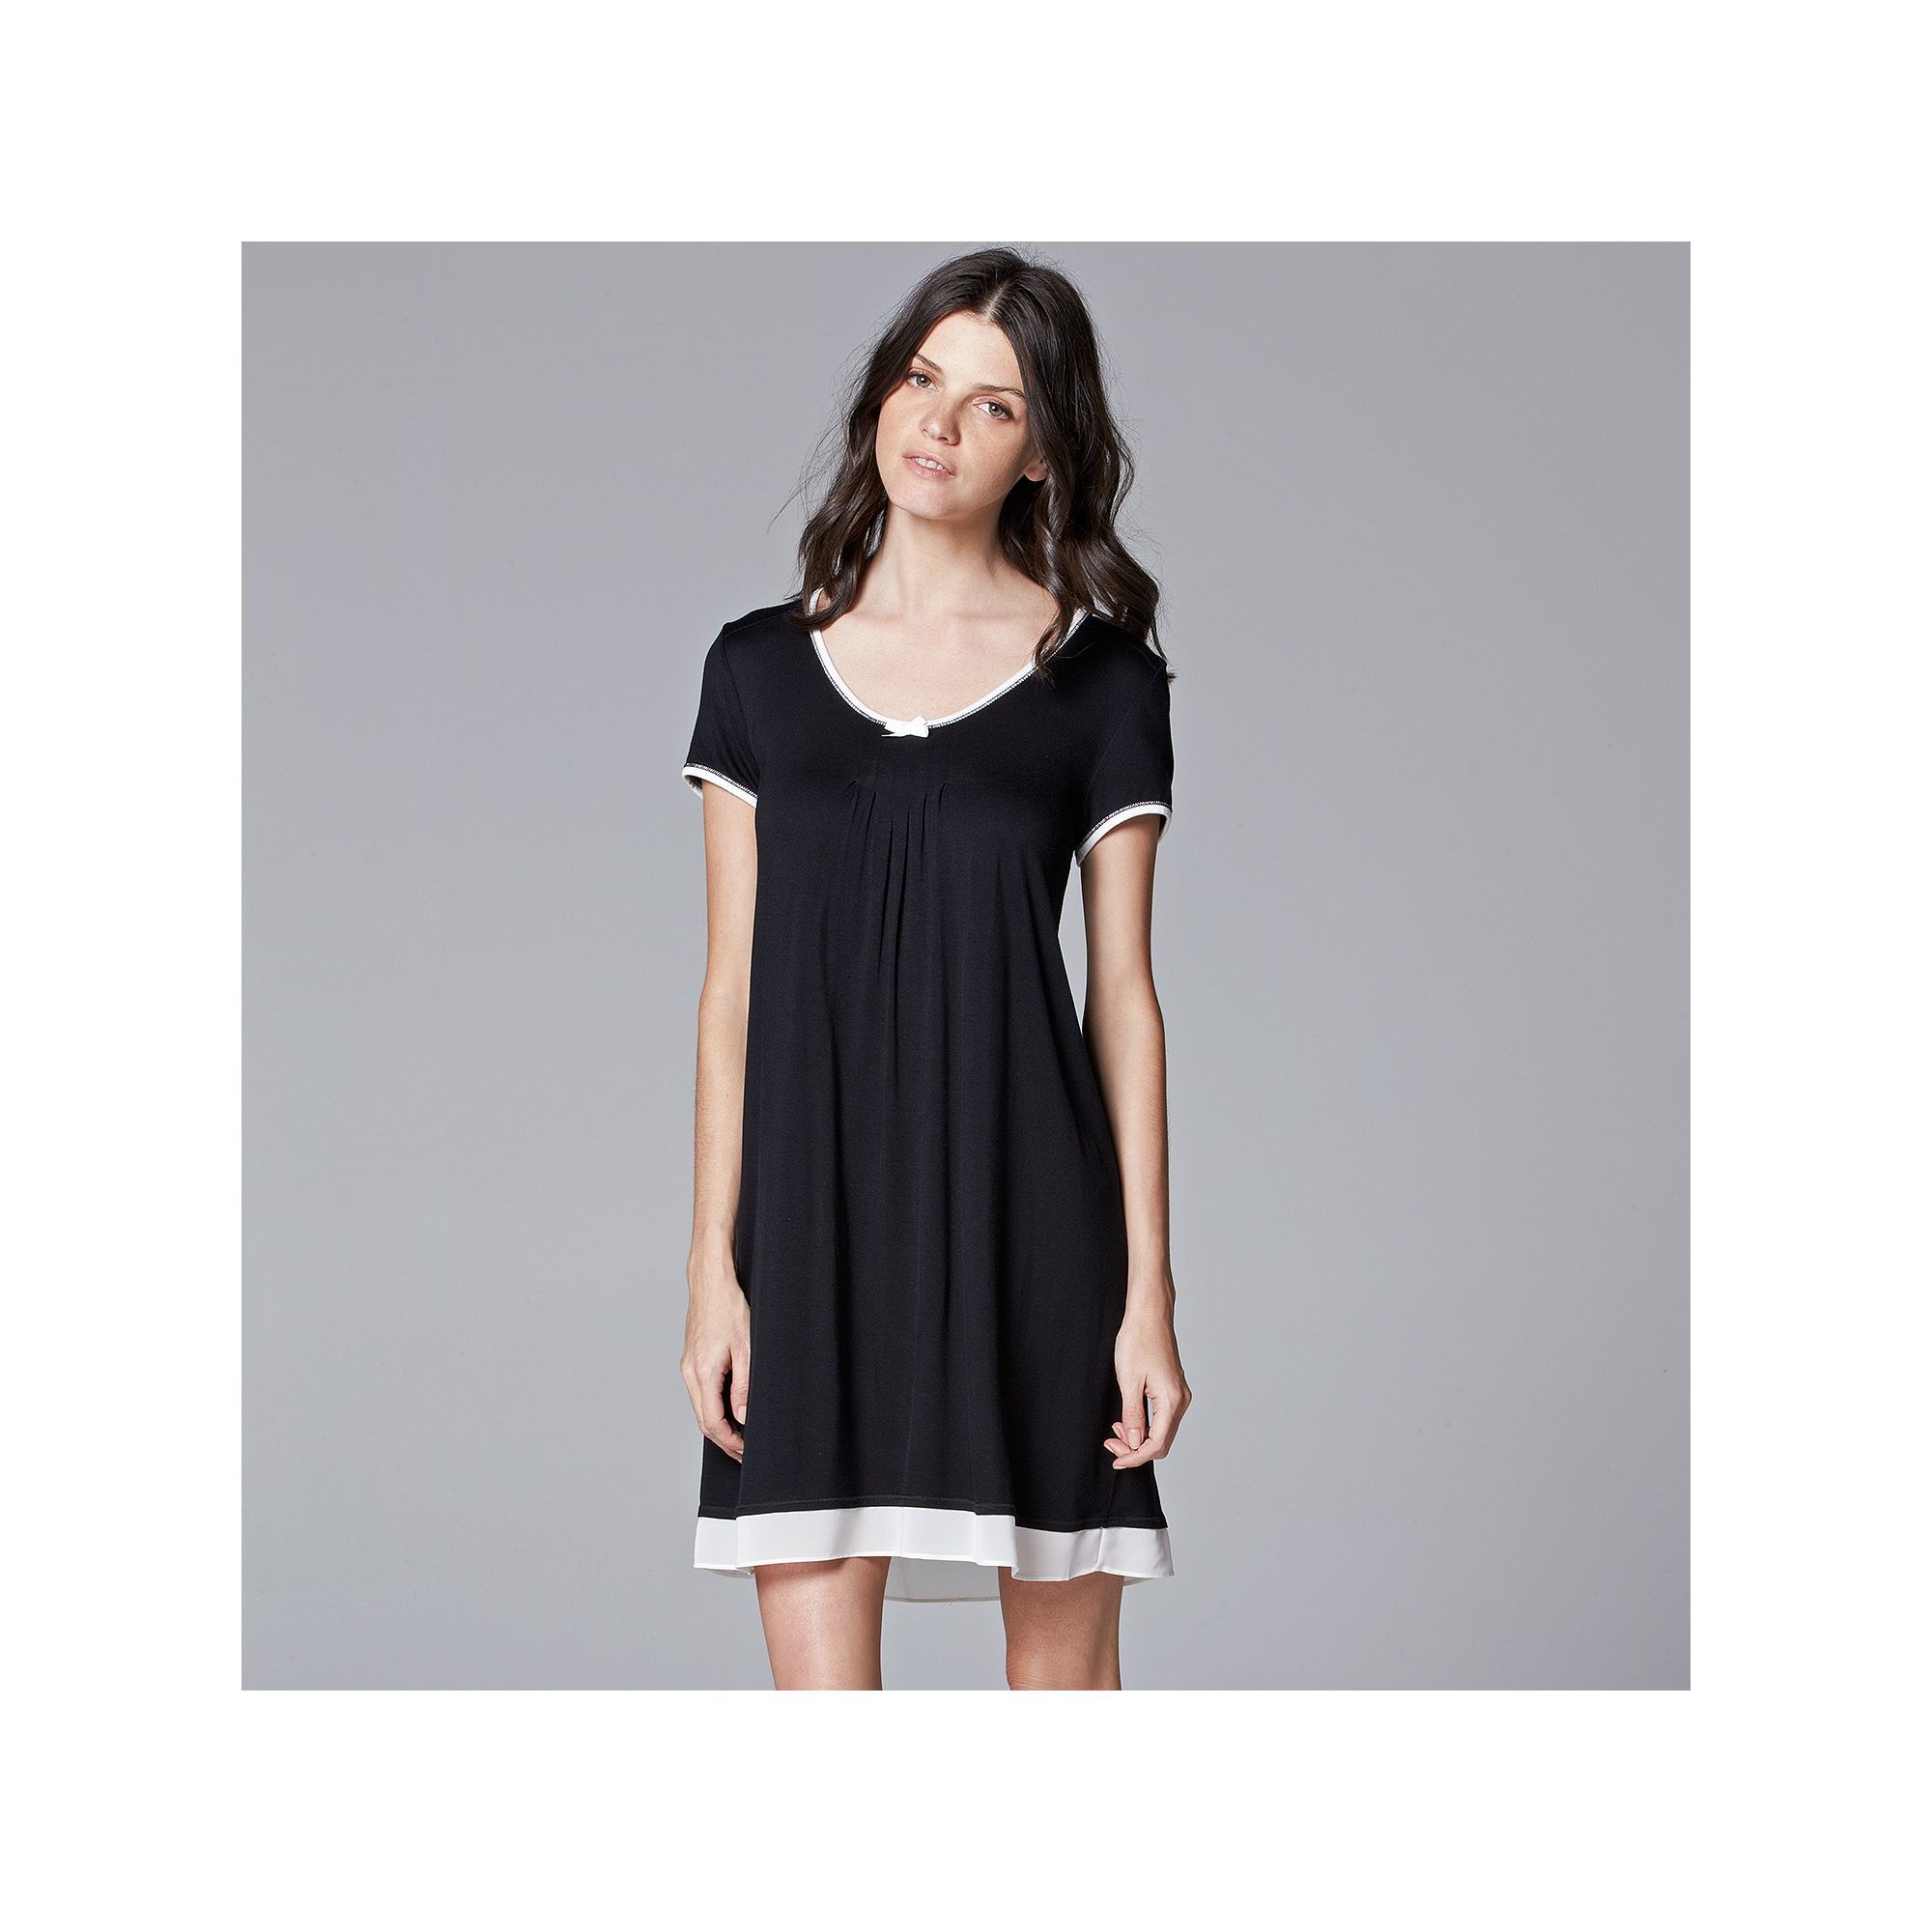 2131d0951 Women s Simply Vera Vera Wang Pajamas  Basic Luxury Sleep Shirt ...